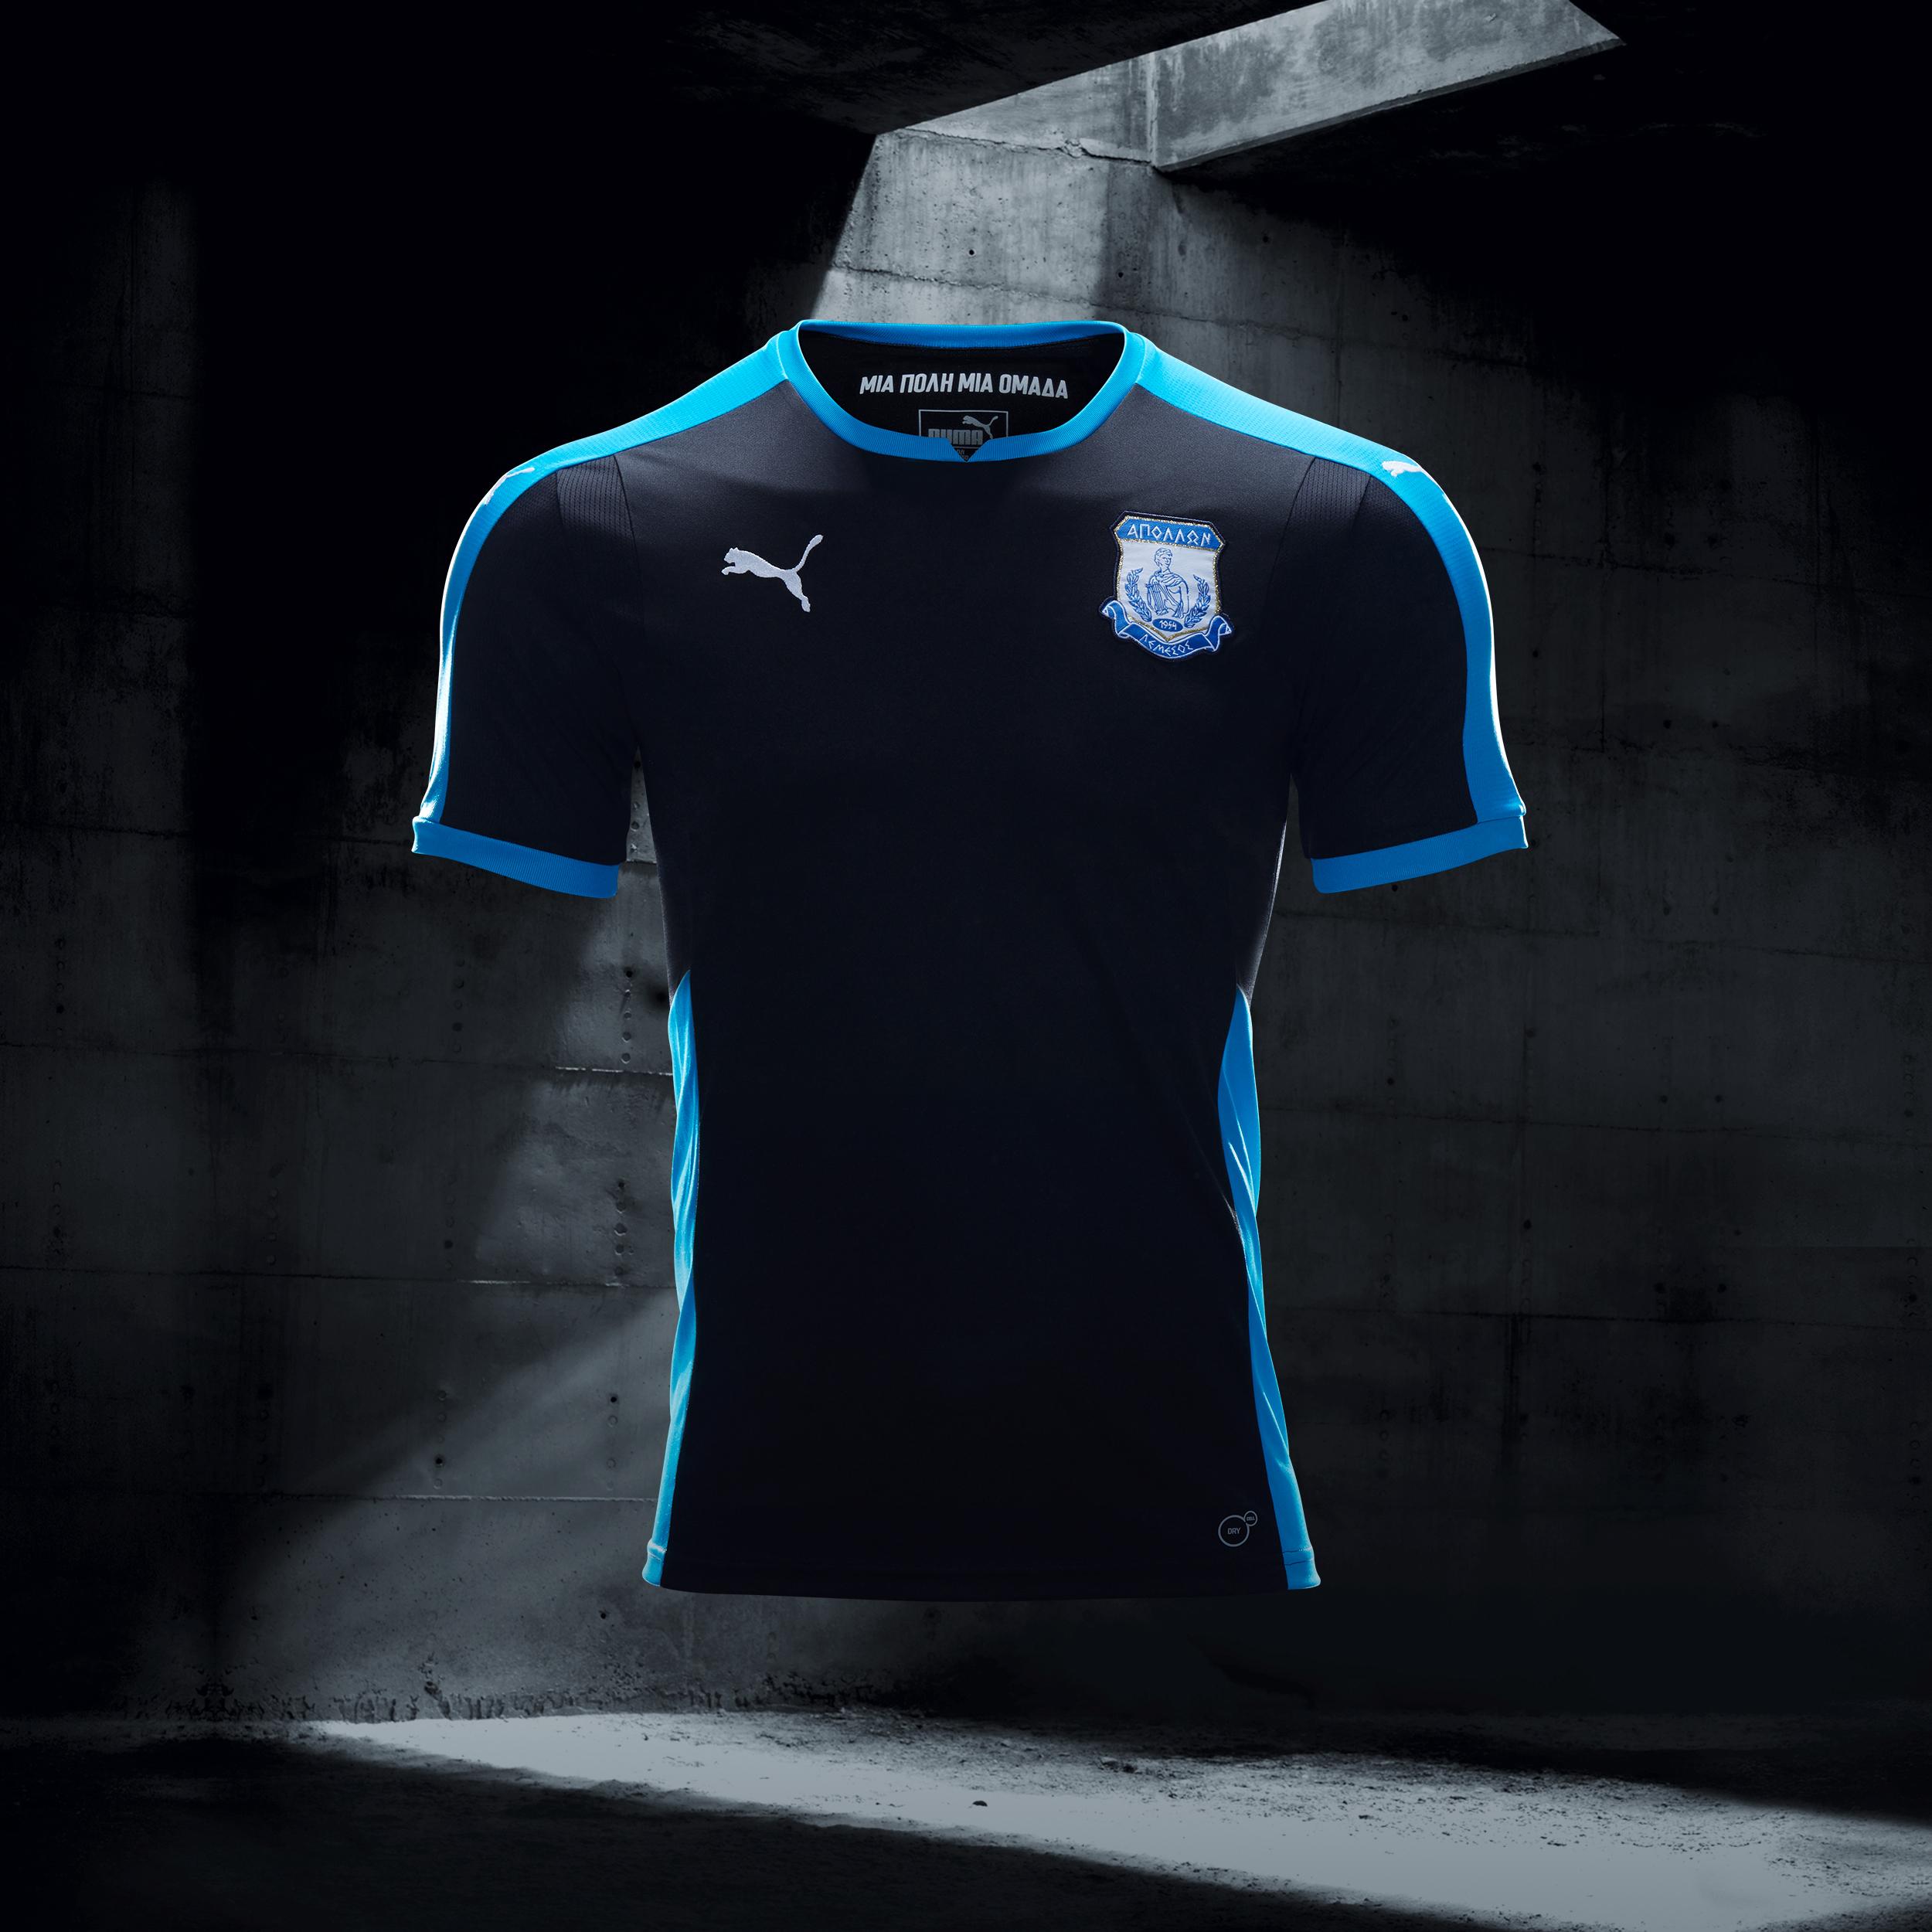 Panamá apresenta seu uniforme para a Copa do Mundo inspirado na ... 71919c577a7a0